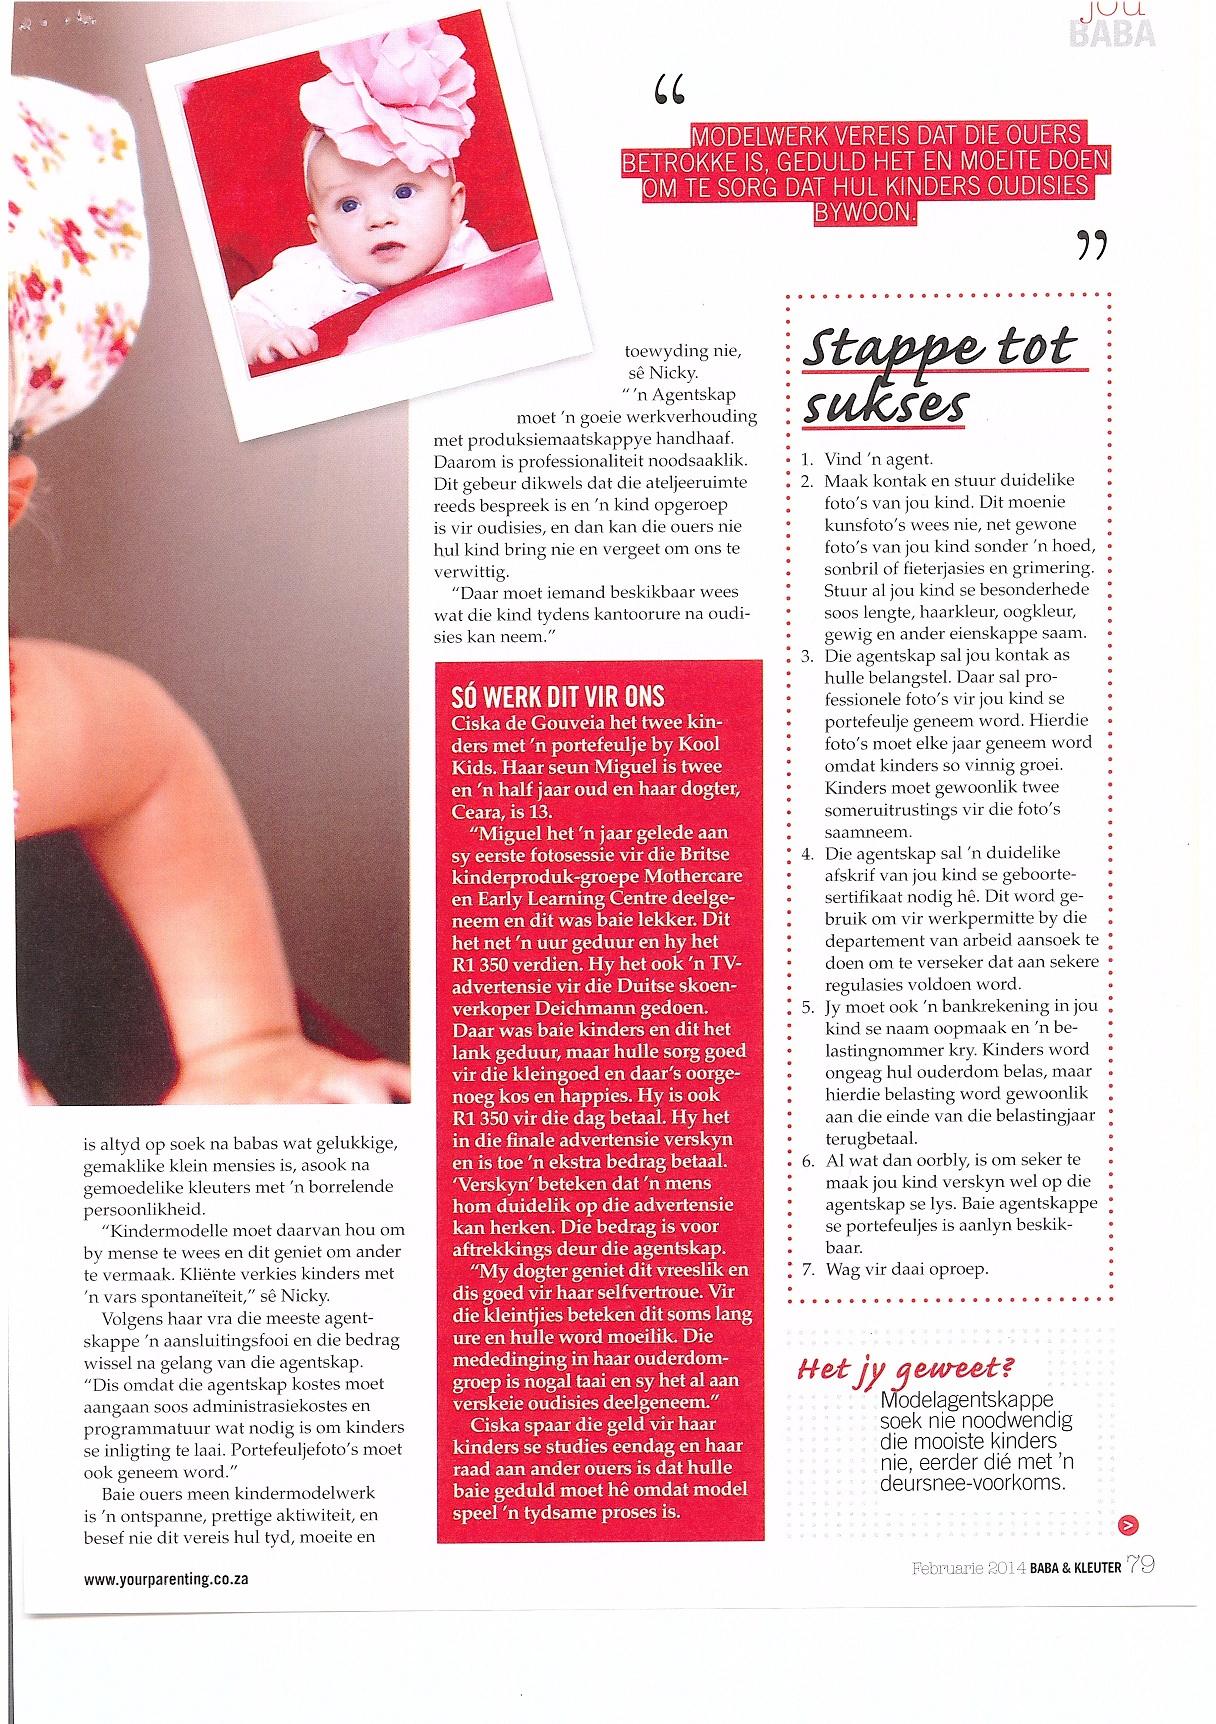 Baba en Kleuter Magazine Feb 2014 Article on Casting Industry Featuring Kool Kids P3